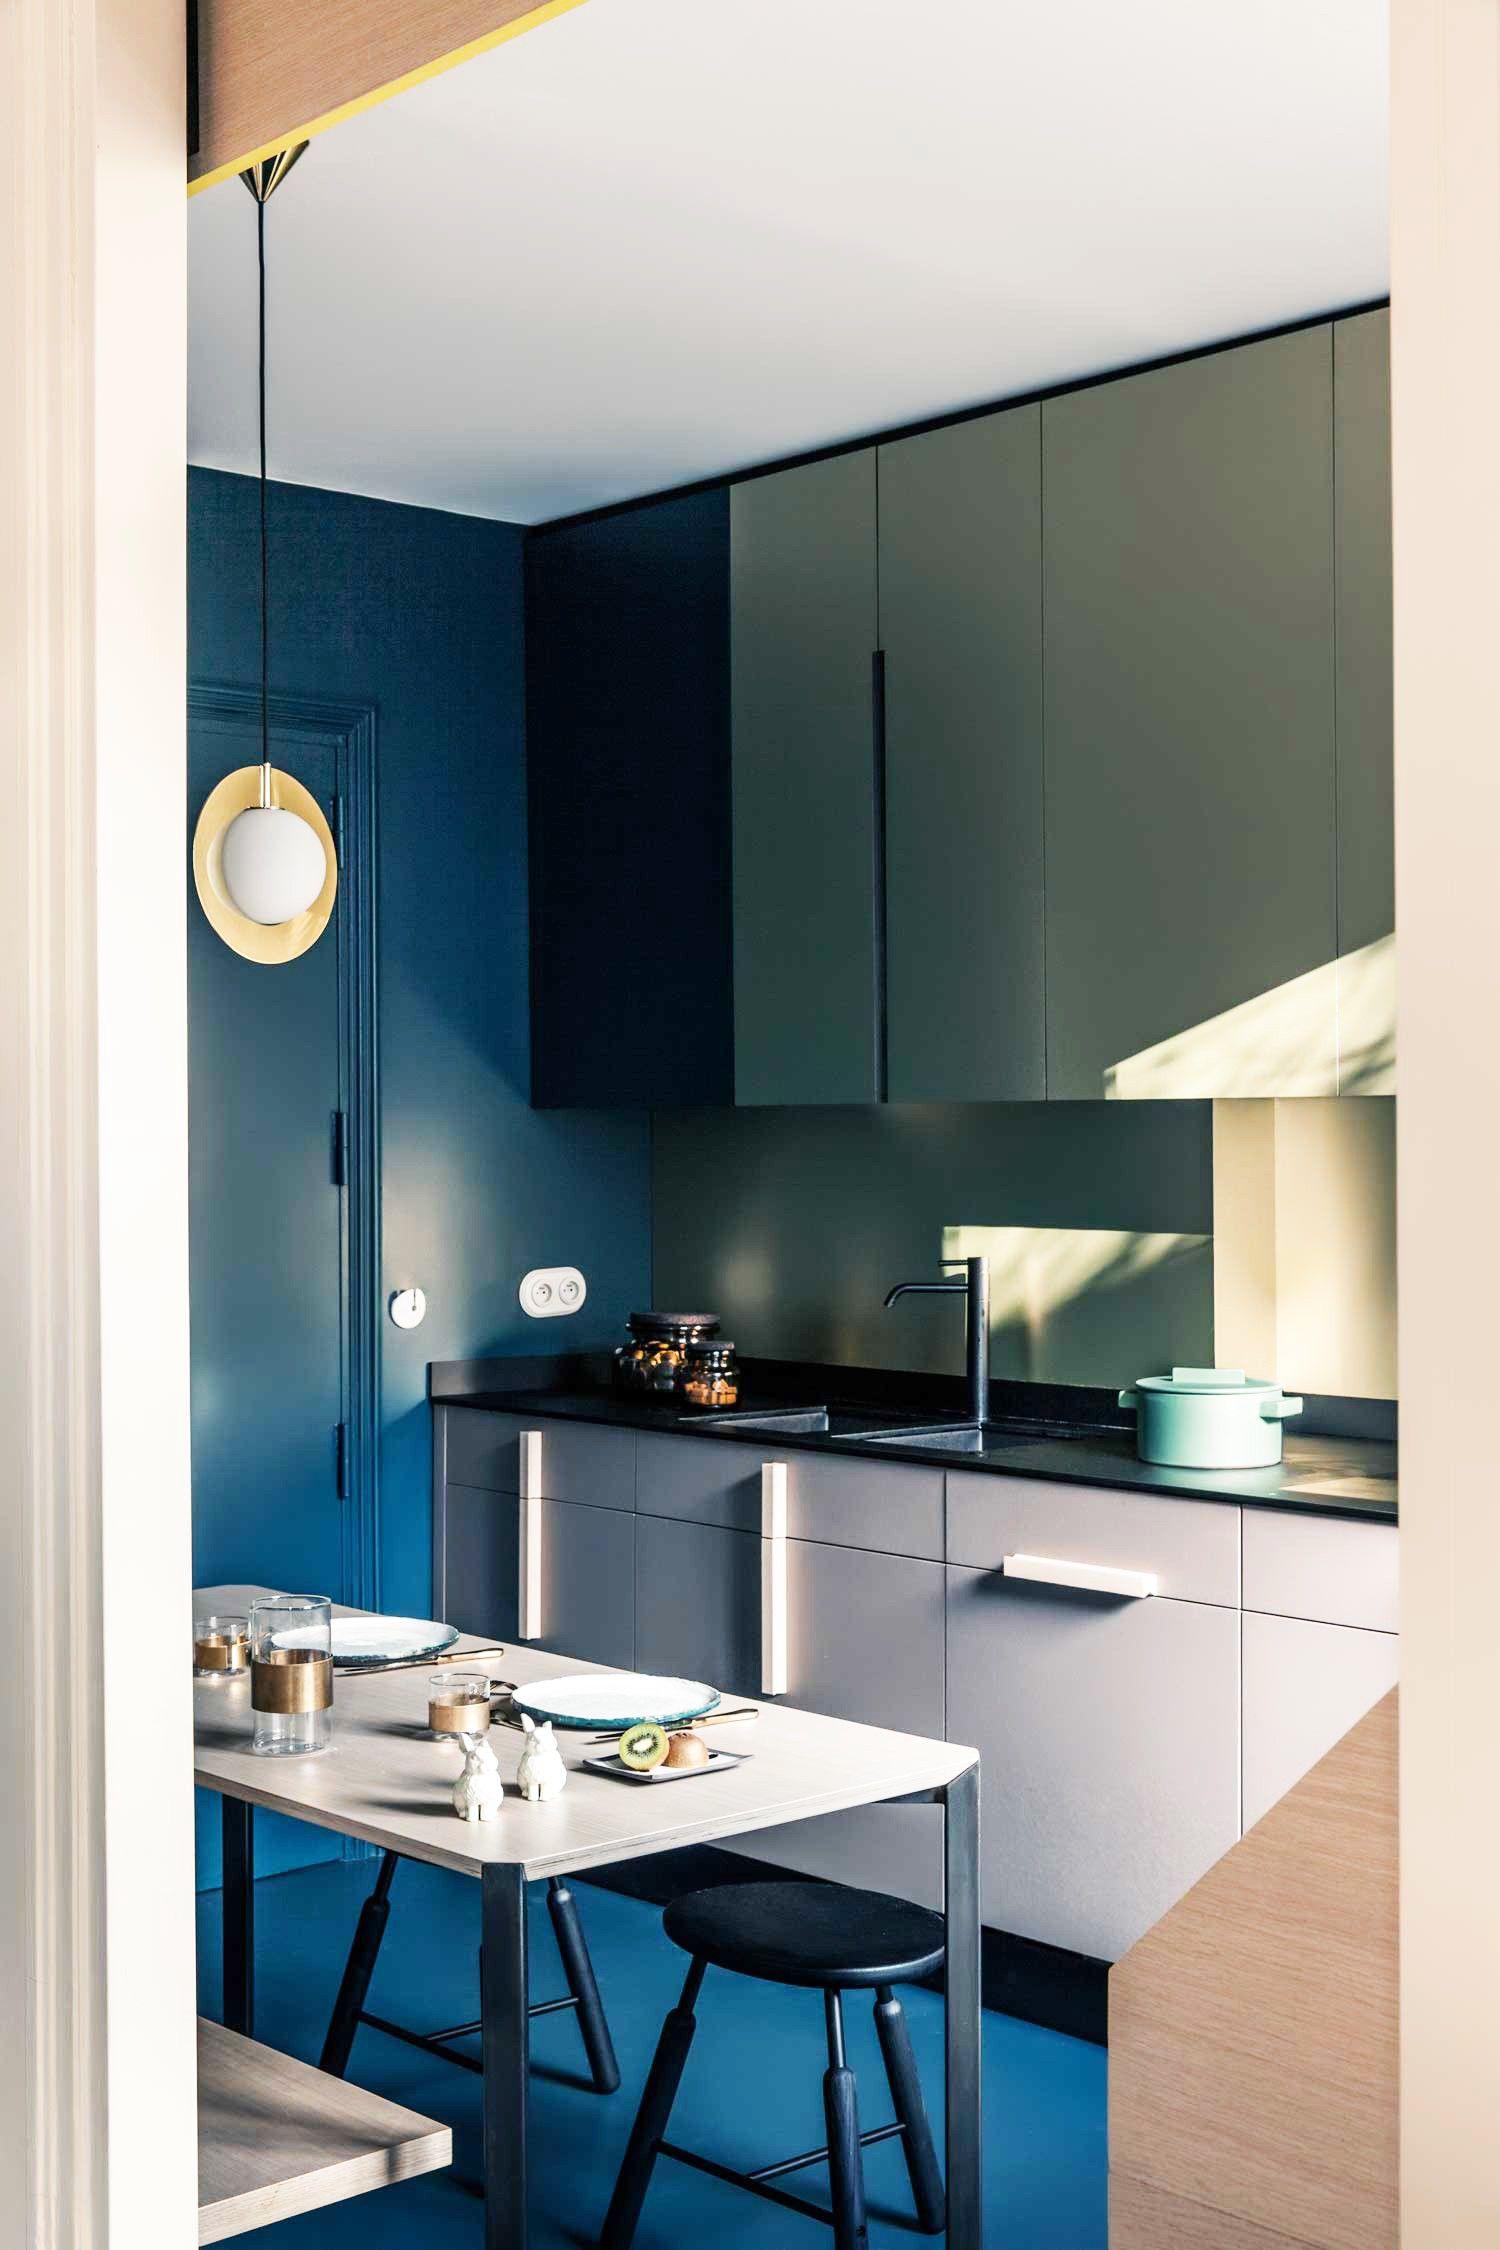 Tour a Whimsical 1930s Apartment in Paris via @MyDomaine